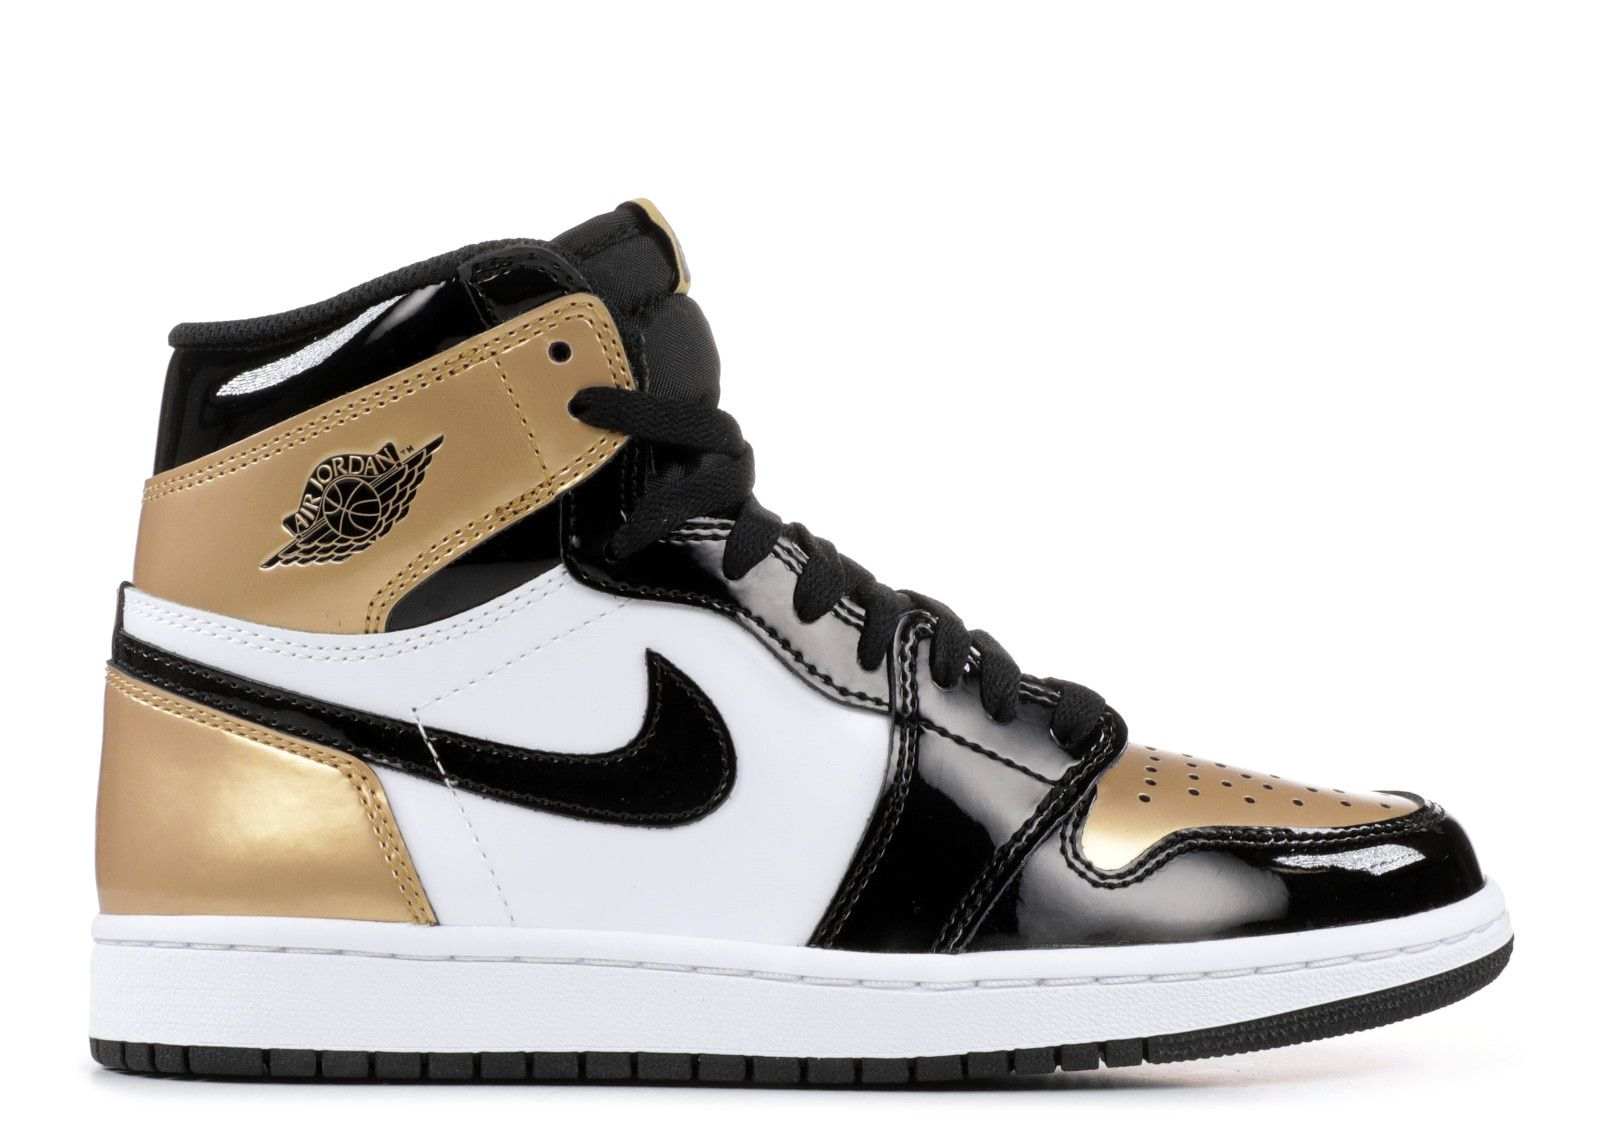 Air Jordan 1 Retro High Og Nrg Gold Toe With Images Air